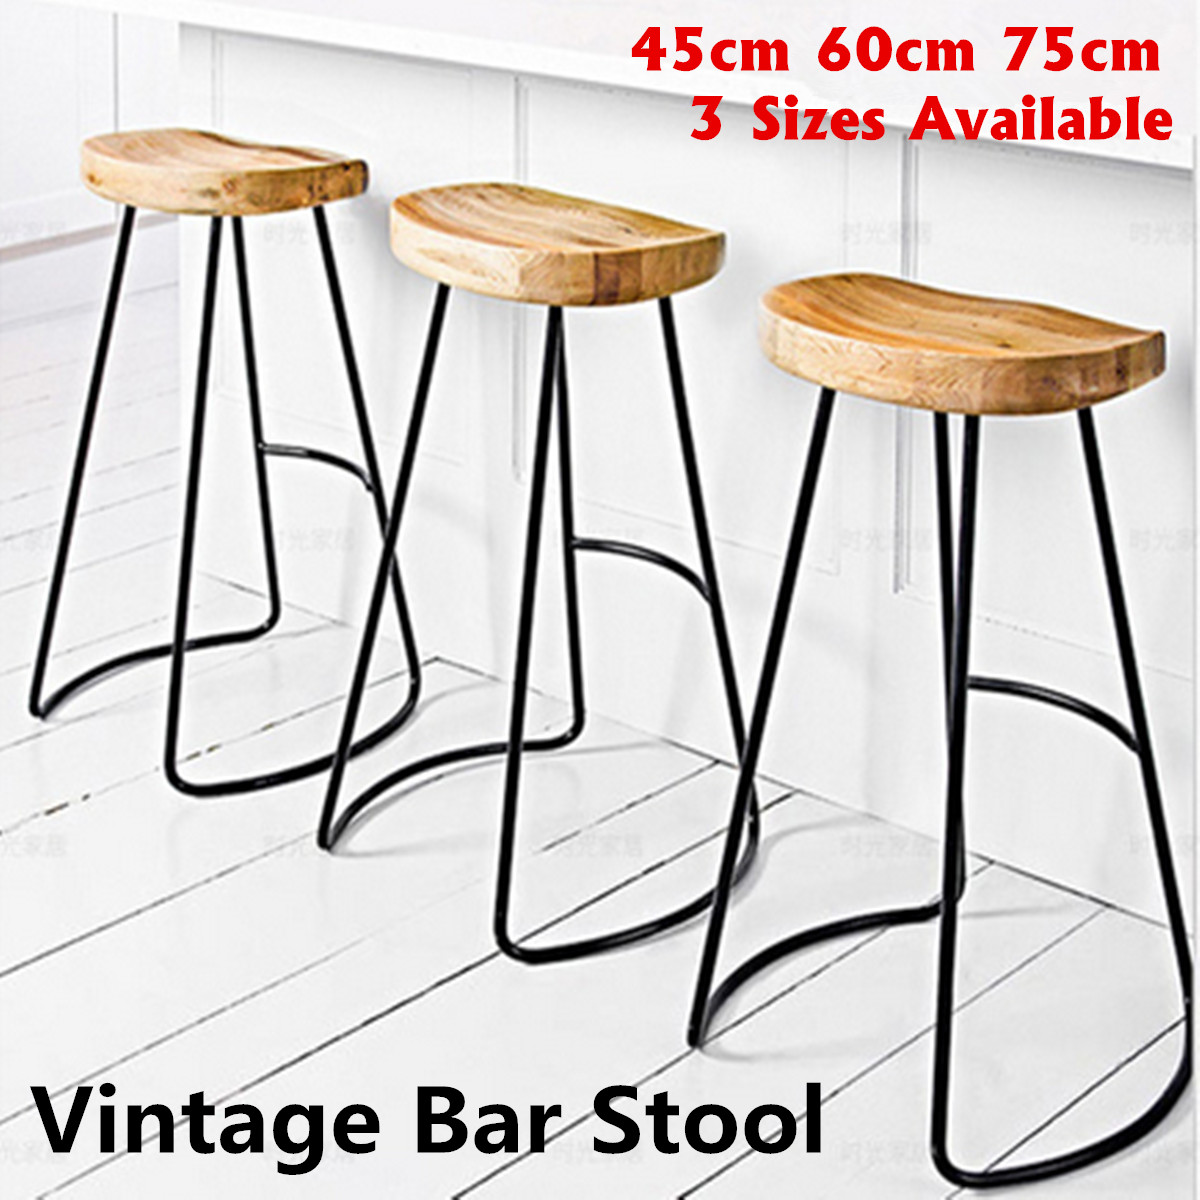 Vintage Industrial Bar Stool Retro Counter Seat Retro Pub Kitchen Metal Wood Chair Outdoor Bar Furniture Decoration 45/60/75cm